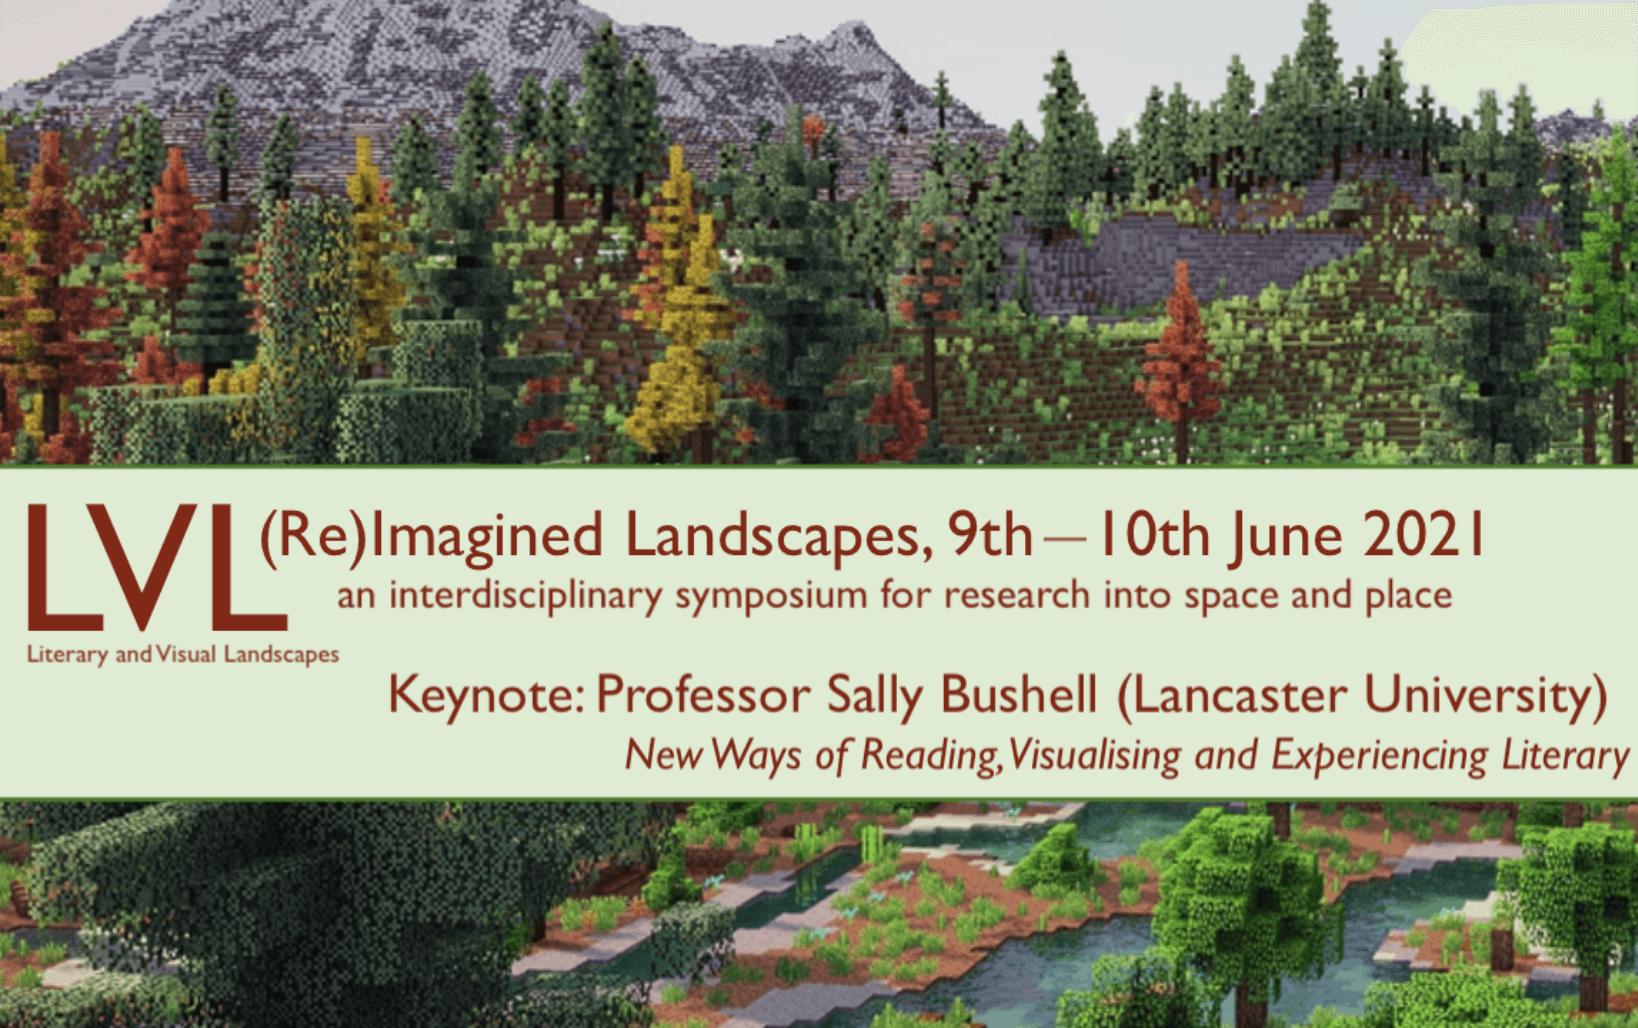 (Re)imagined Landscapes Symposium